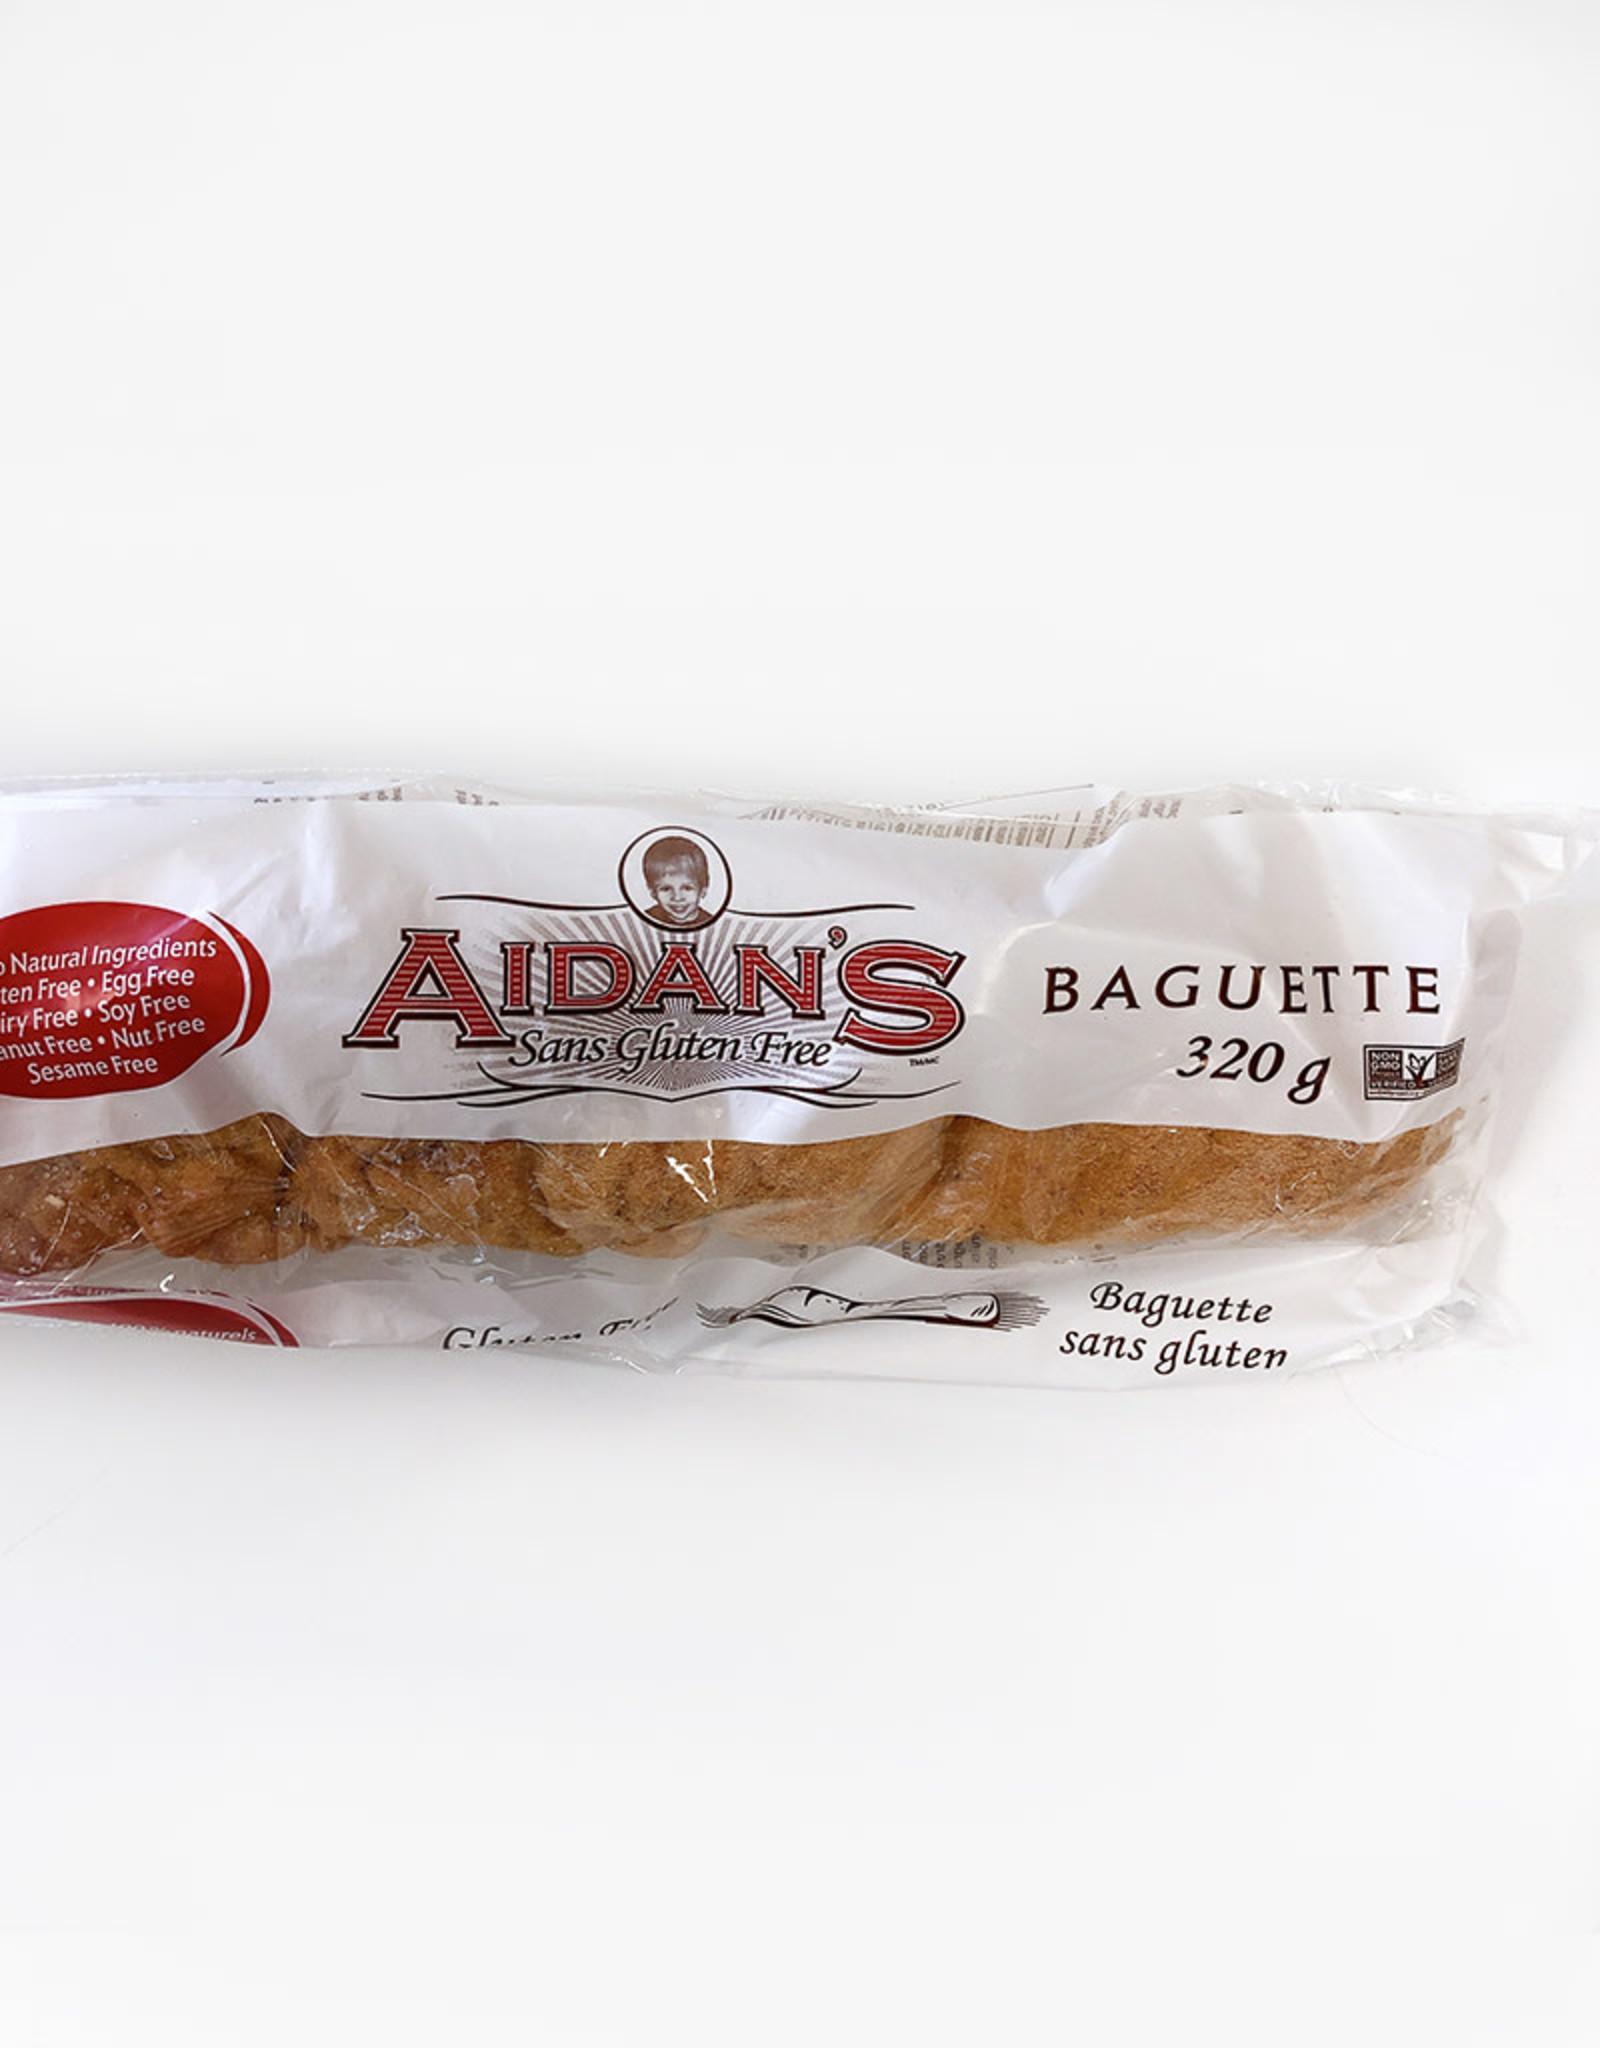 Aidan's Gluten Free Aidans Gluten Free - Baguette